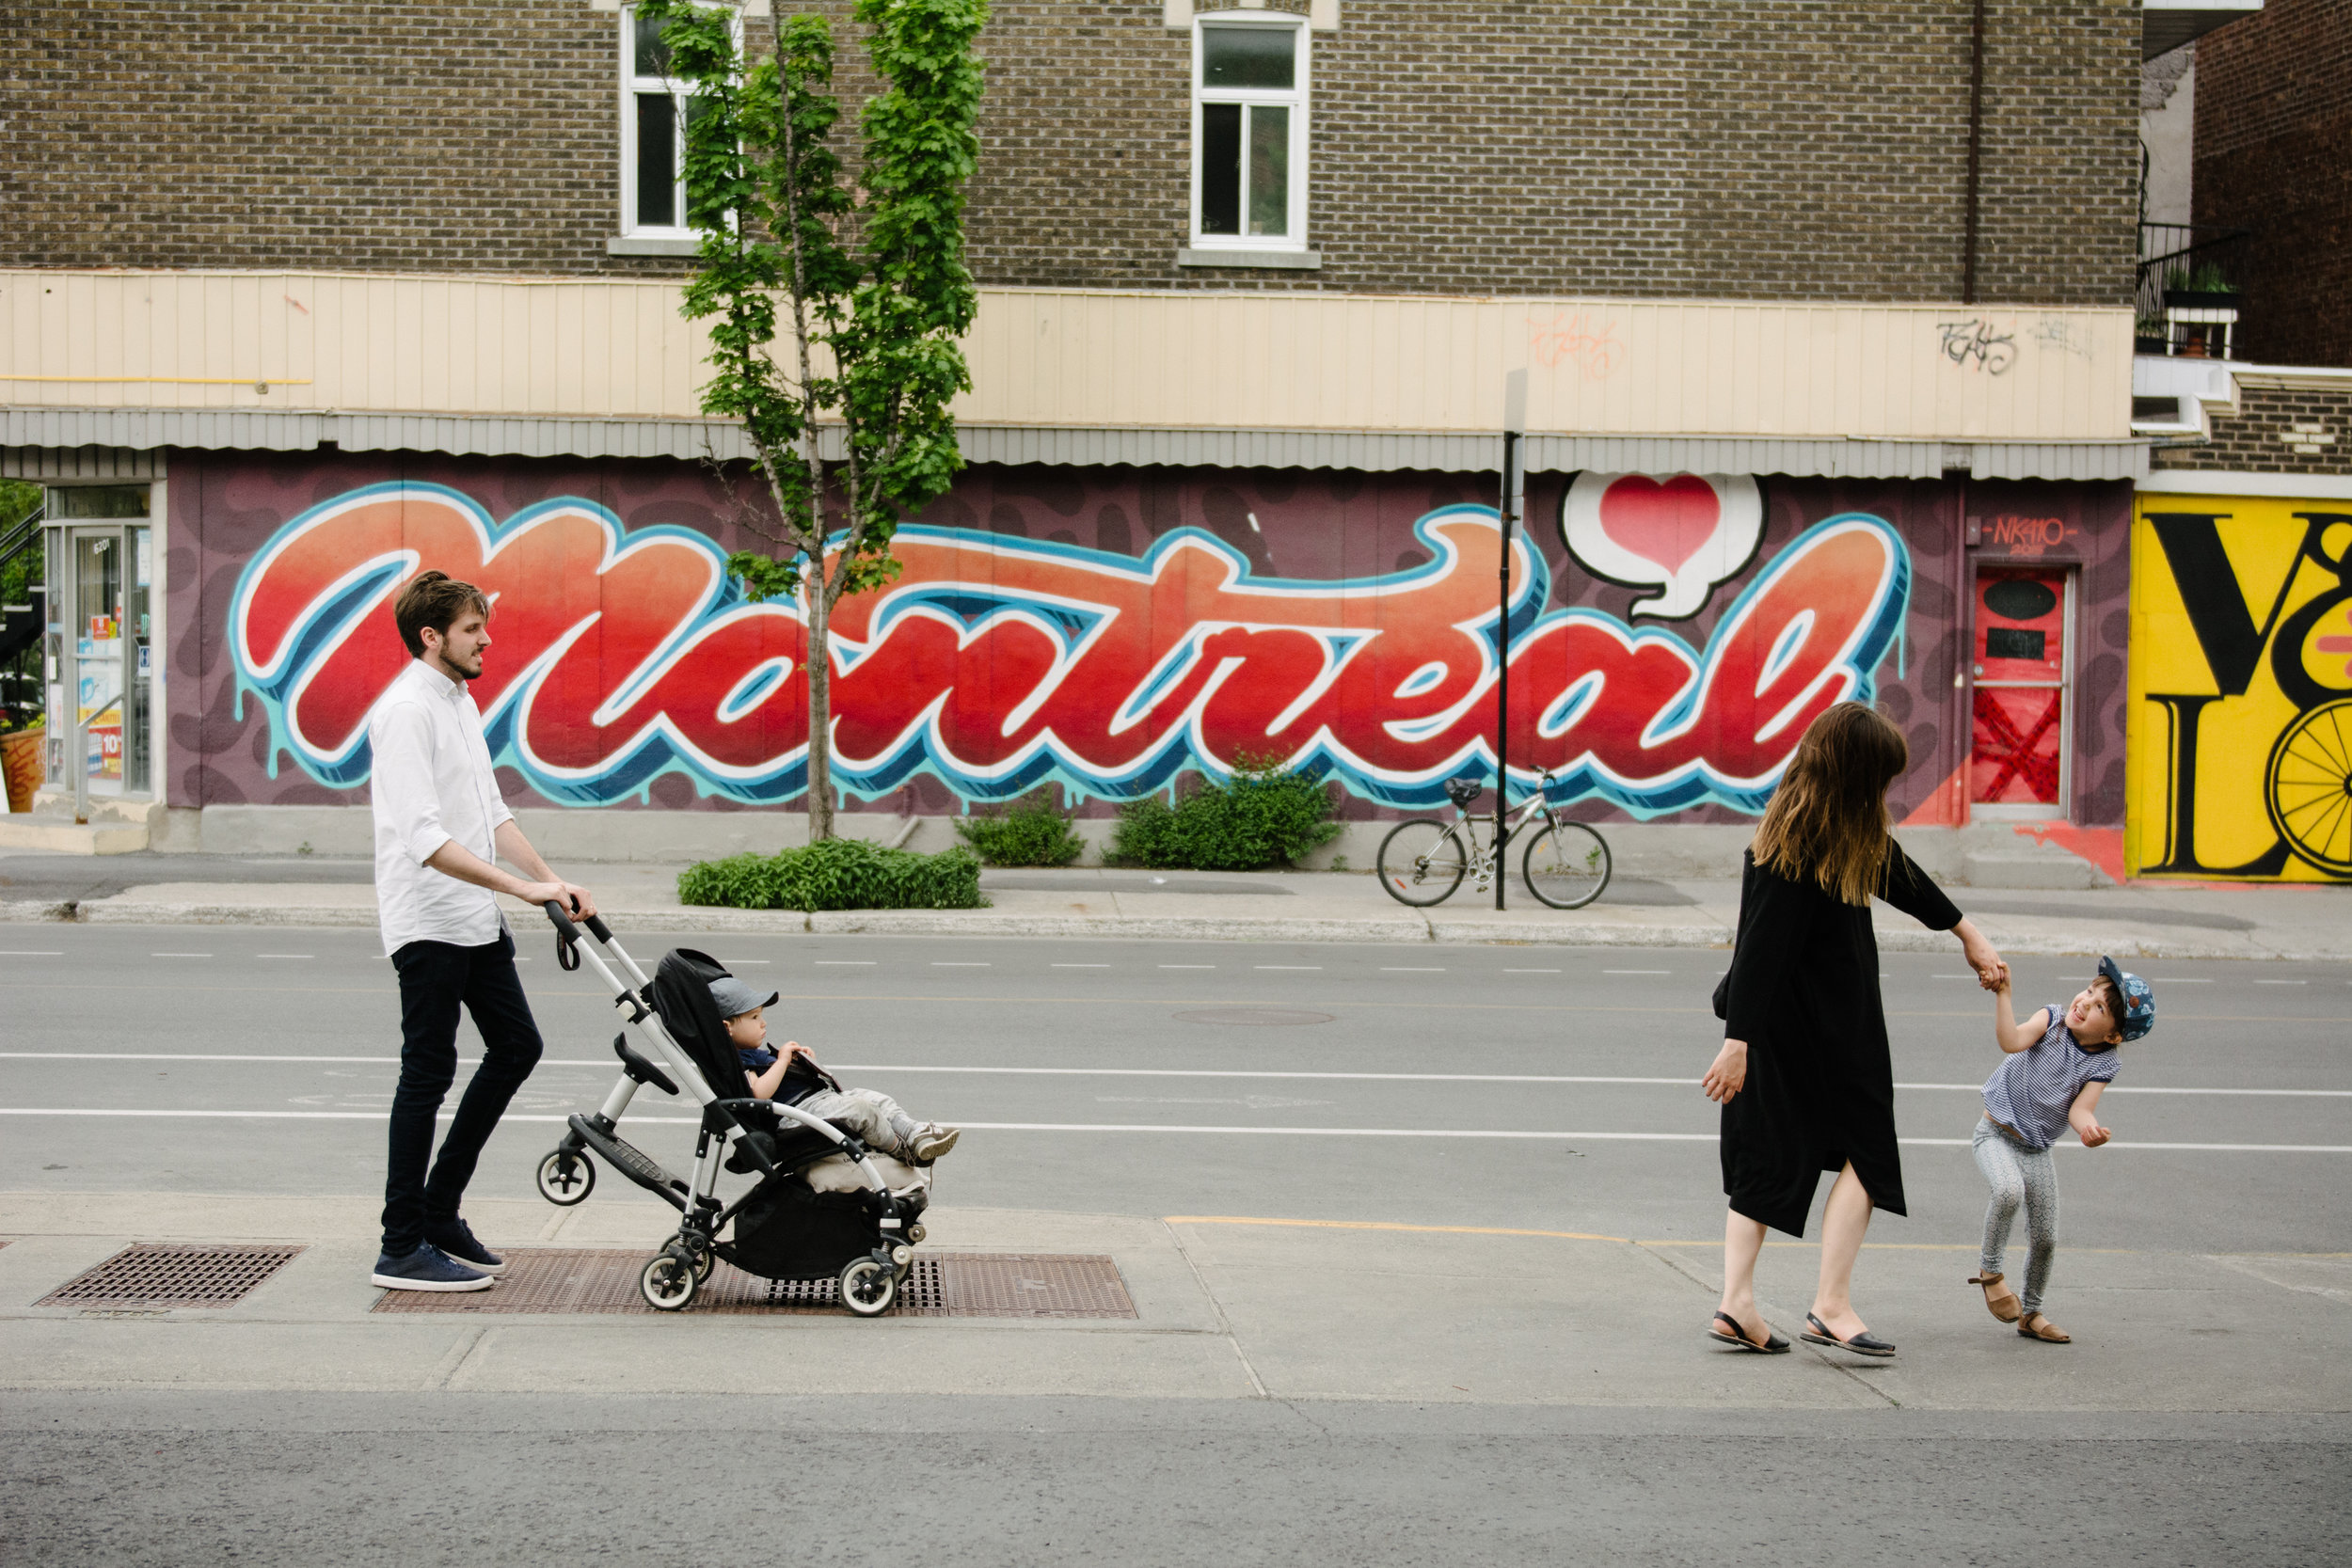 ete_photographe-famille-lifestyle-montreal.jpg